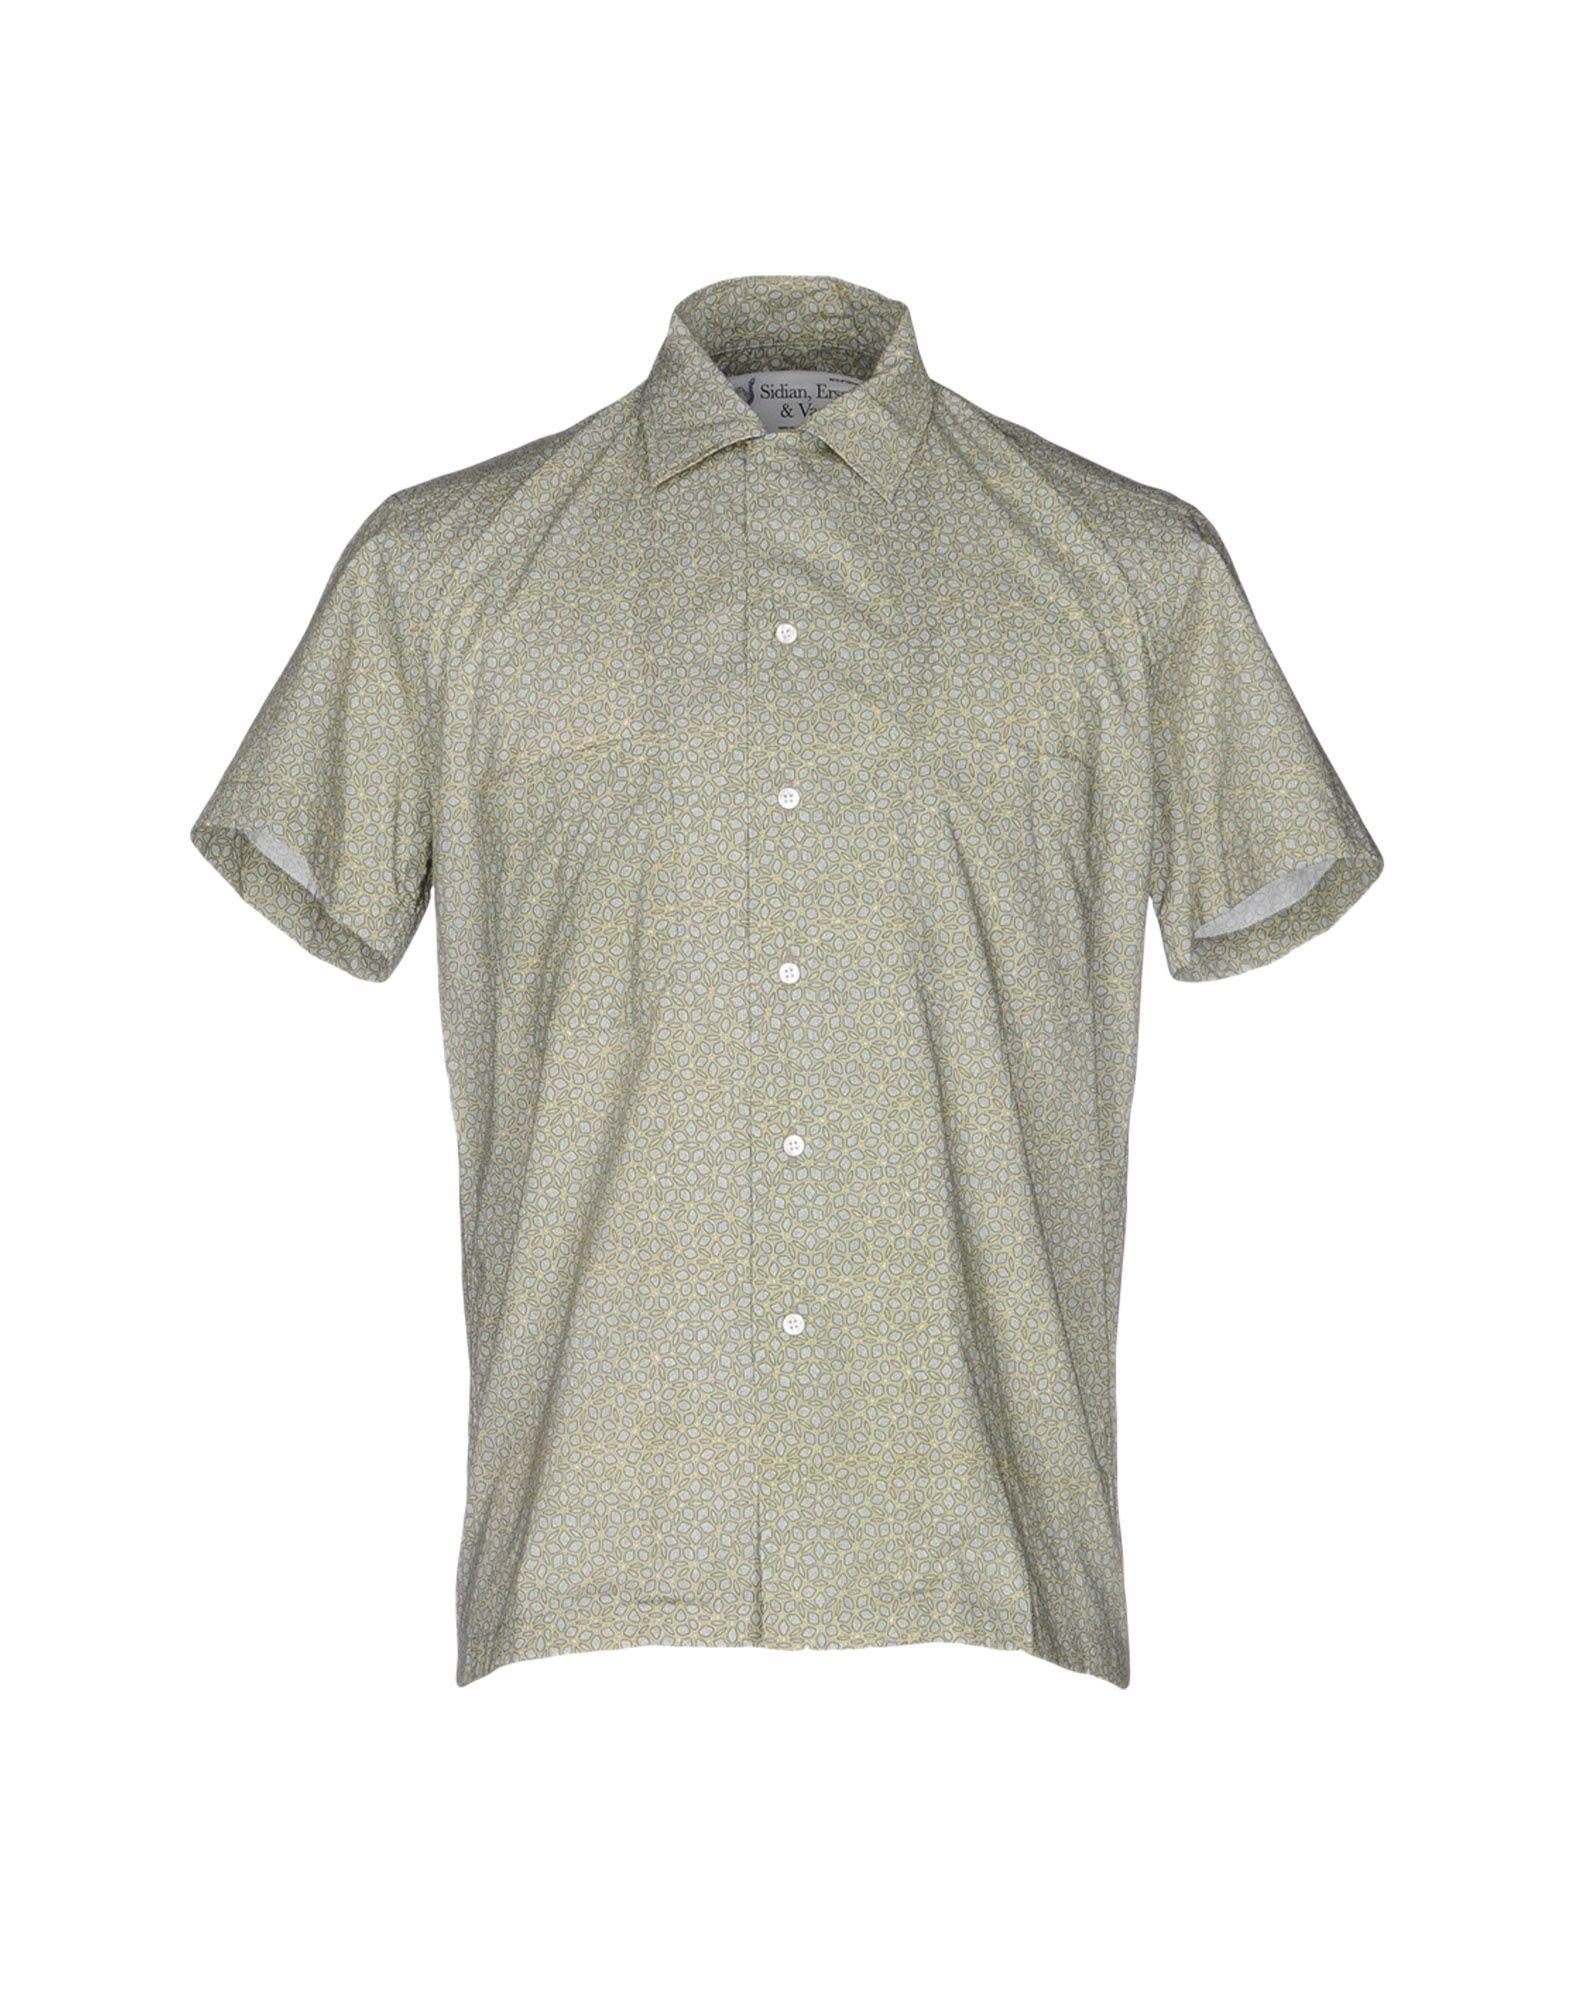 SIDIAN, ERSATZ & VANES Patterned Shirt in Green